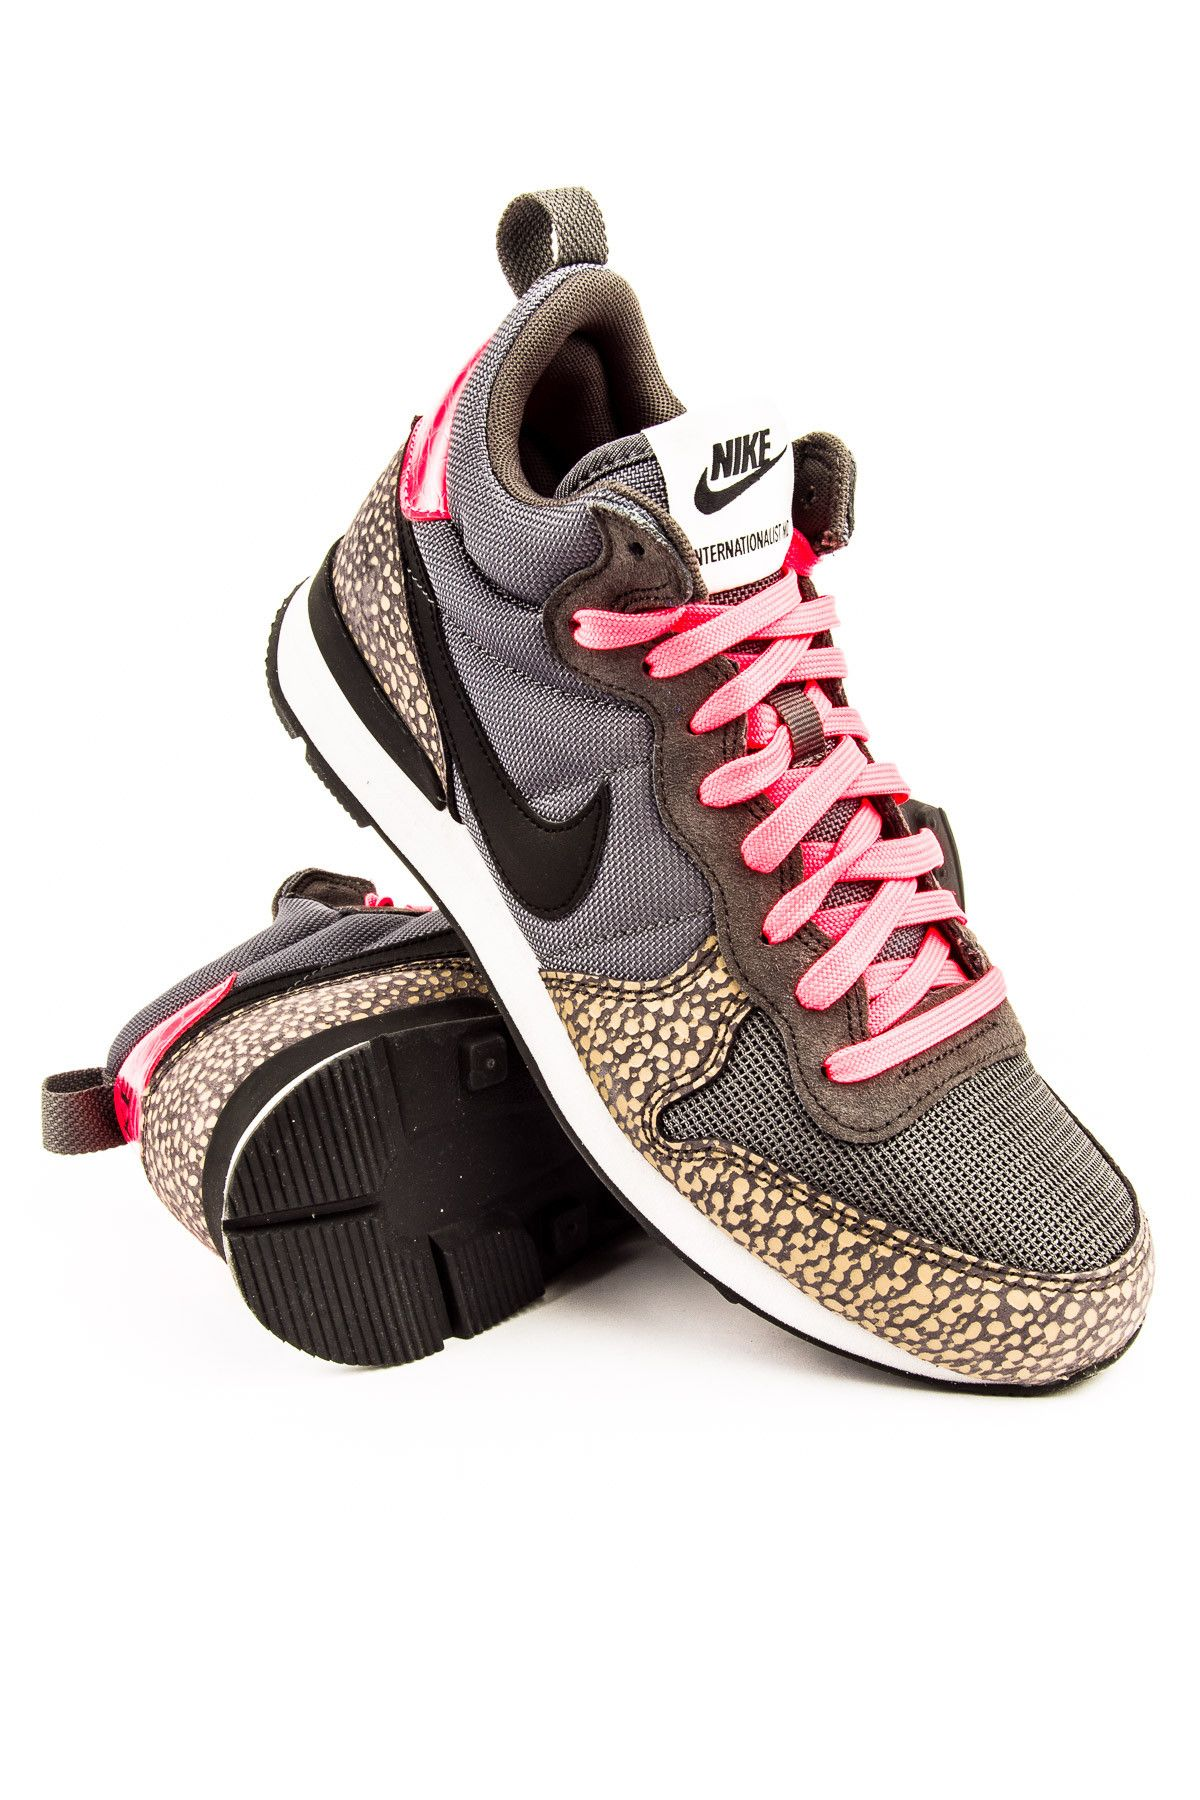 big sale df236 2deba Nike Internationalist Mid Cool Grey  Medium Ash  Bamboo  Black Sneaker